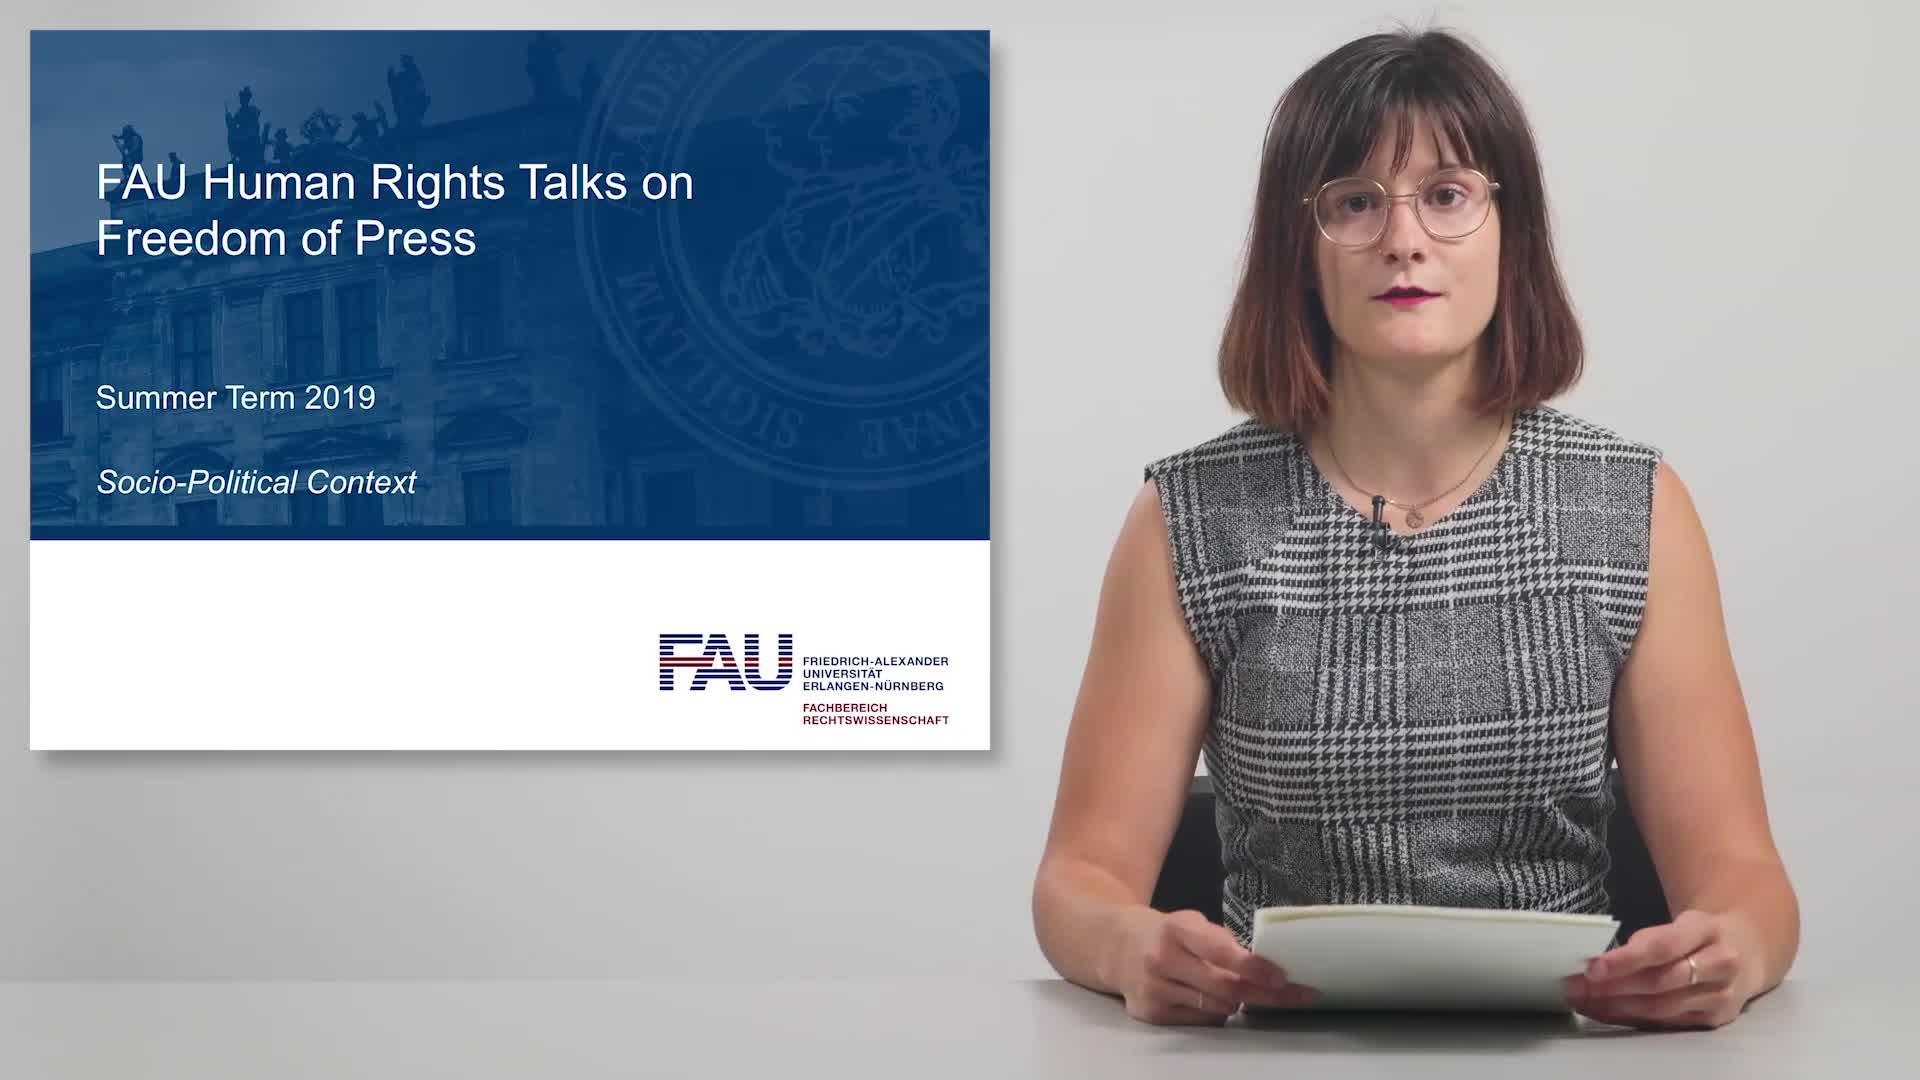 FAU Human Rights Talks – Summer Term 2019: Socio-Political Context preview image